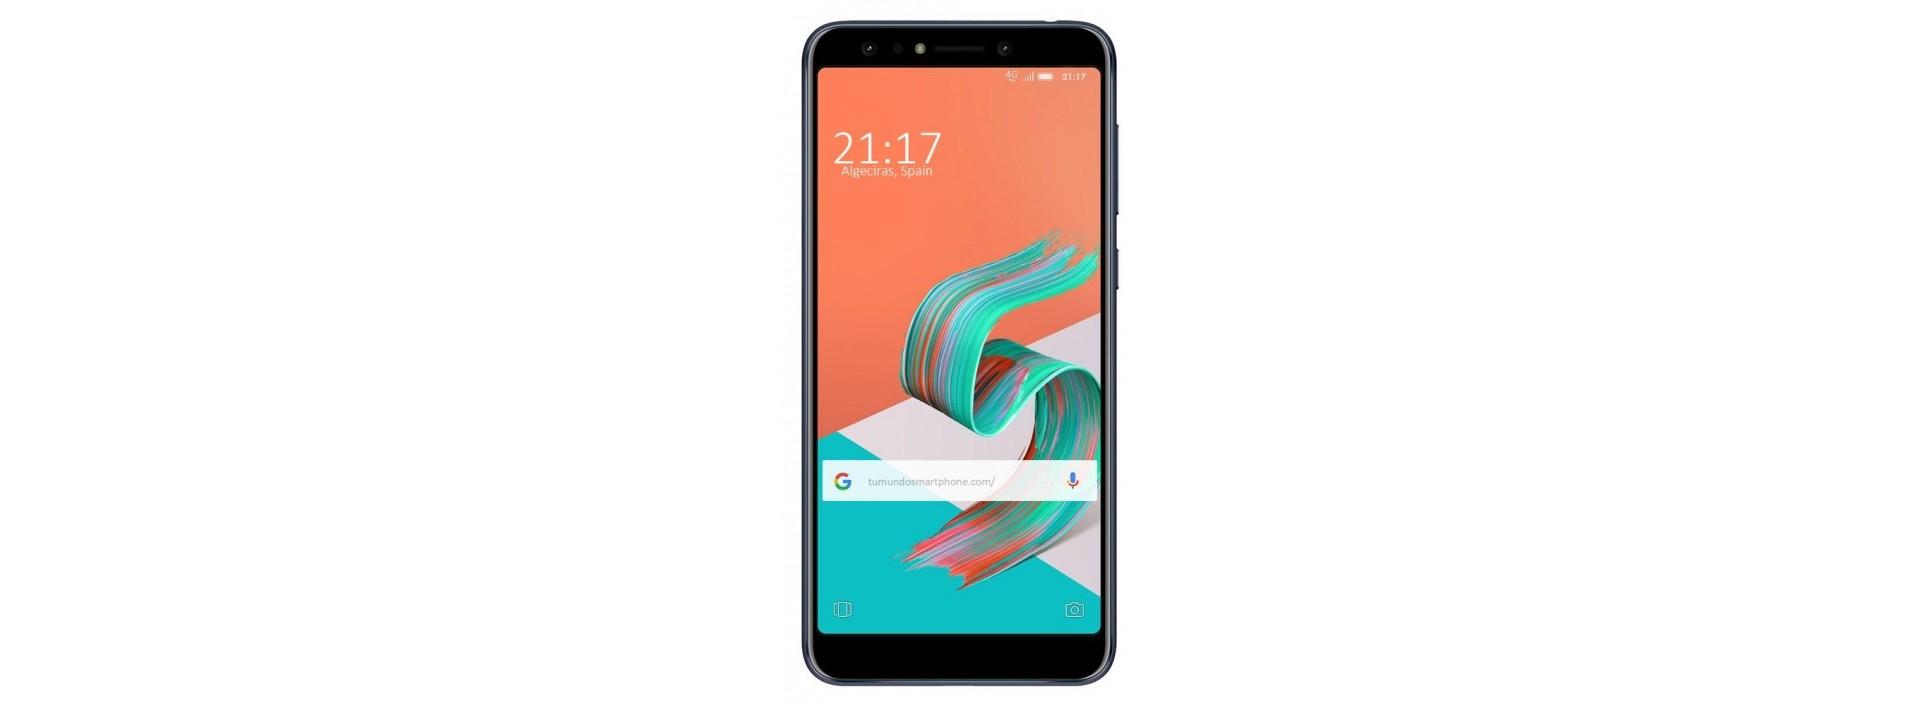 Fundas PERSONALIZADAS Asus Zenfone 5 Lite ZC600KL, Envío Gratis en TMS